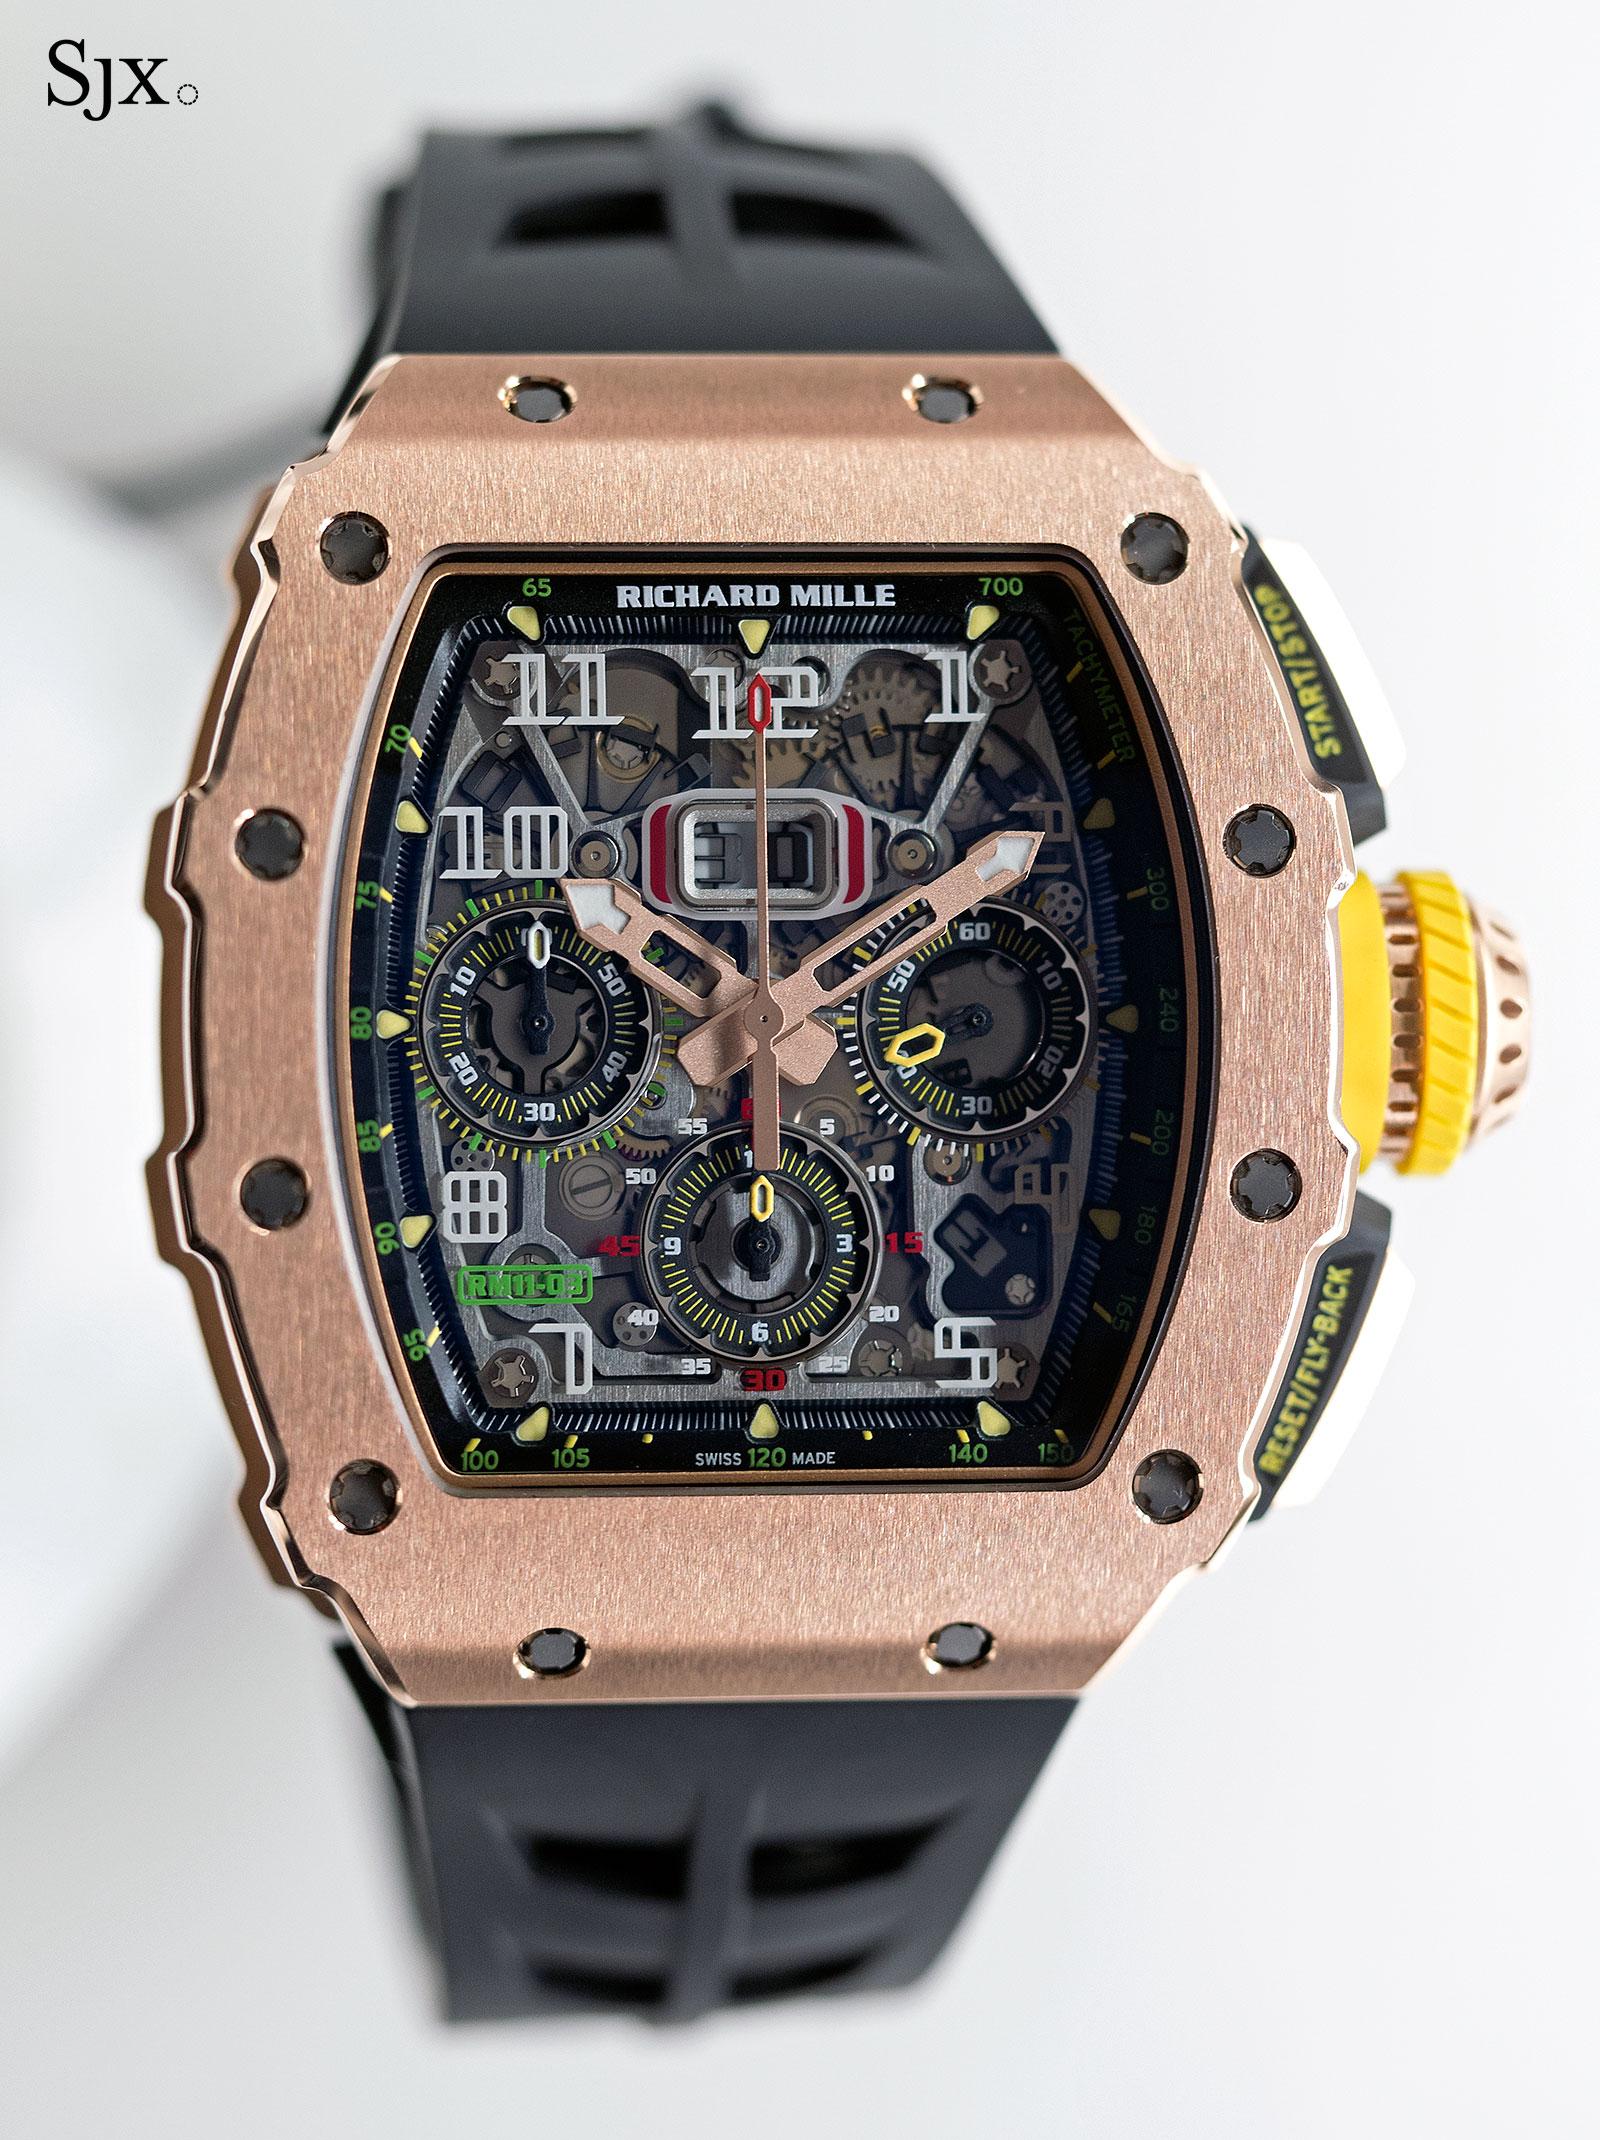 Richard Mille RM 11-03 RG-1